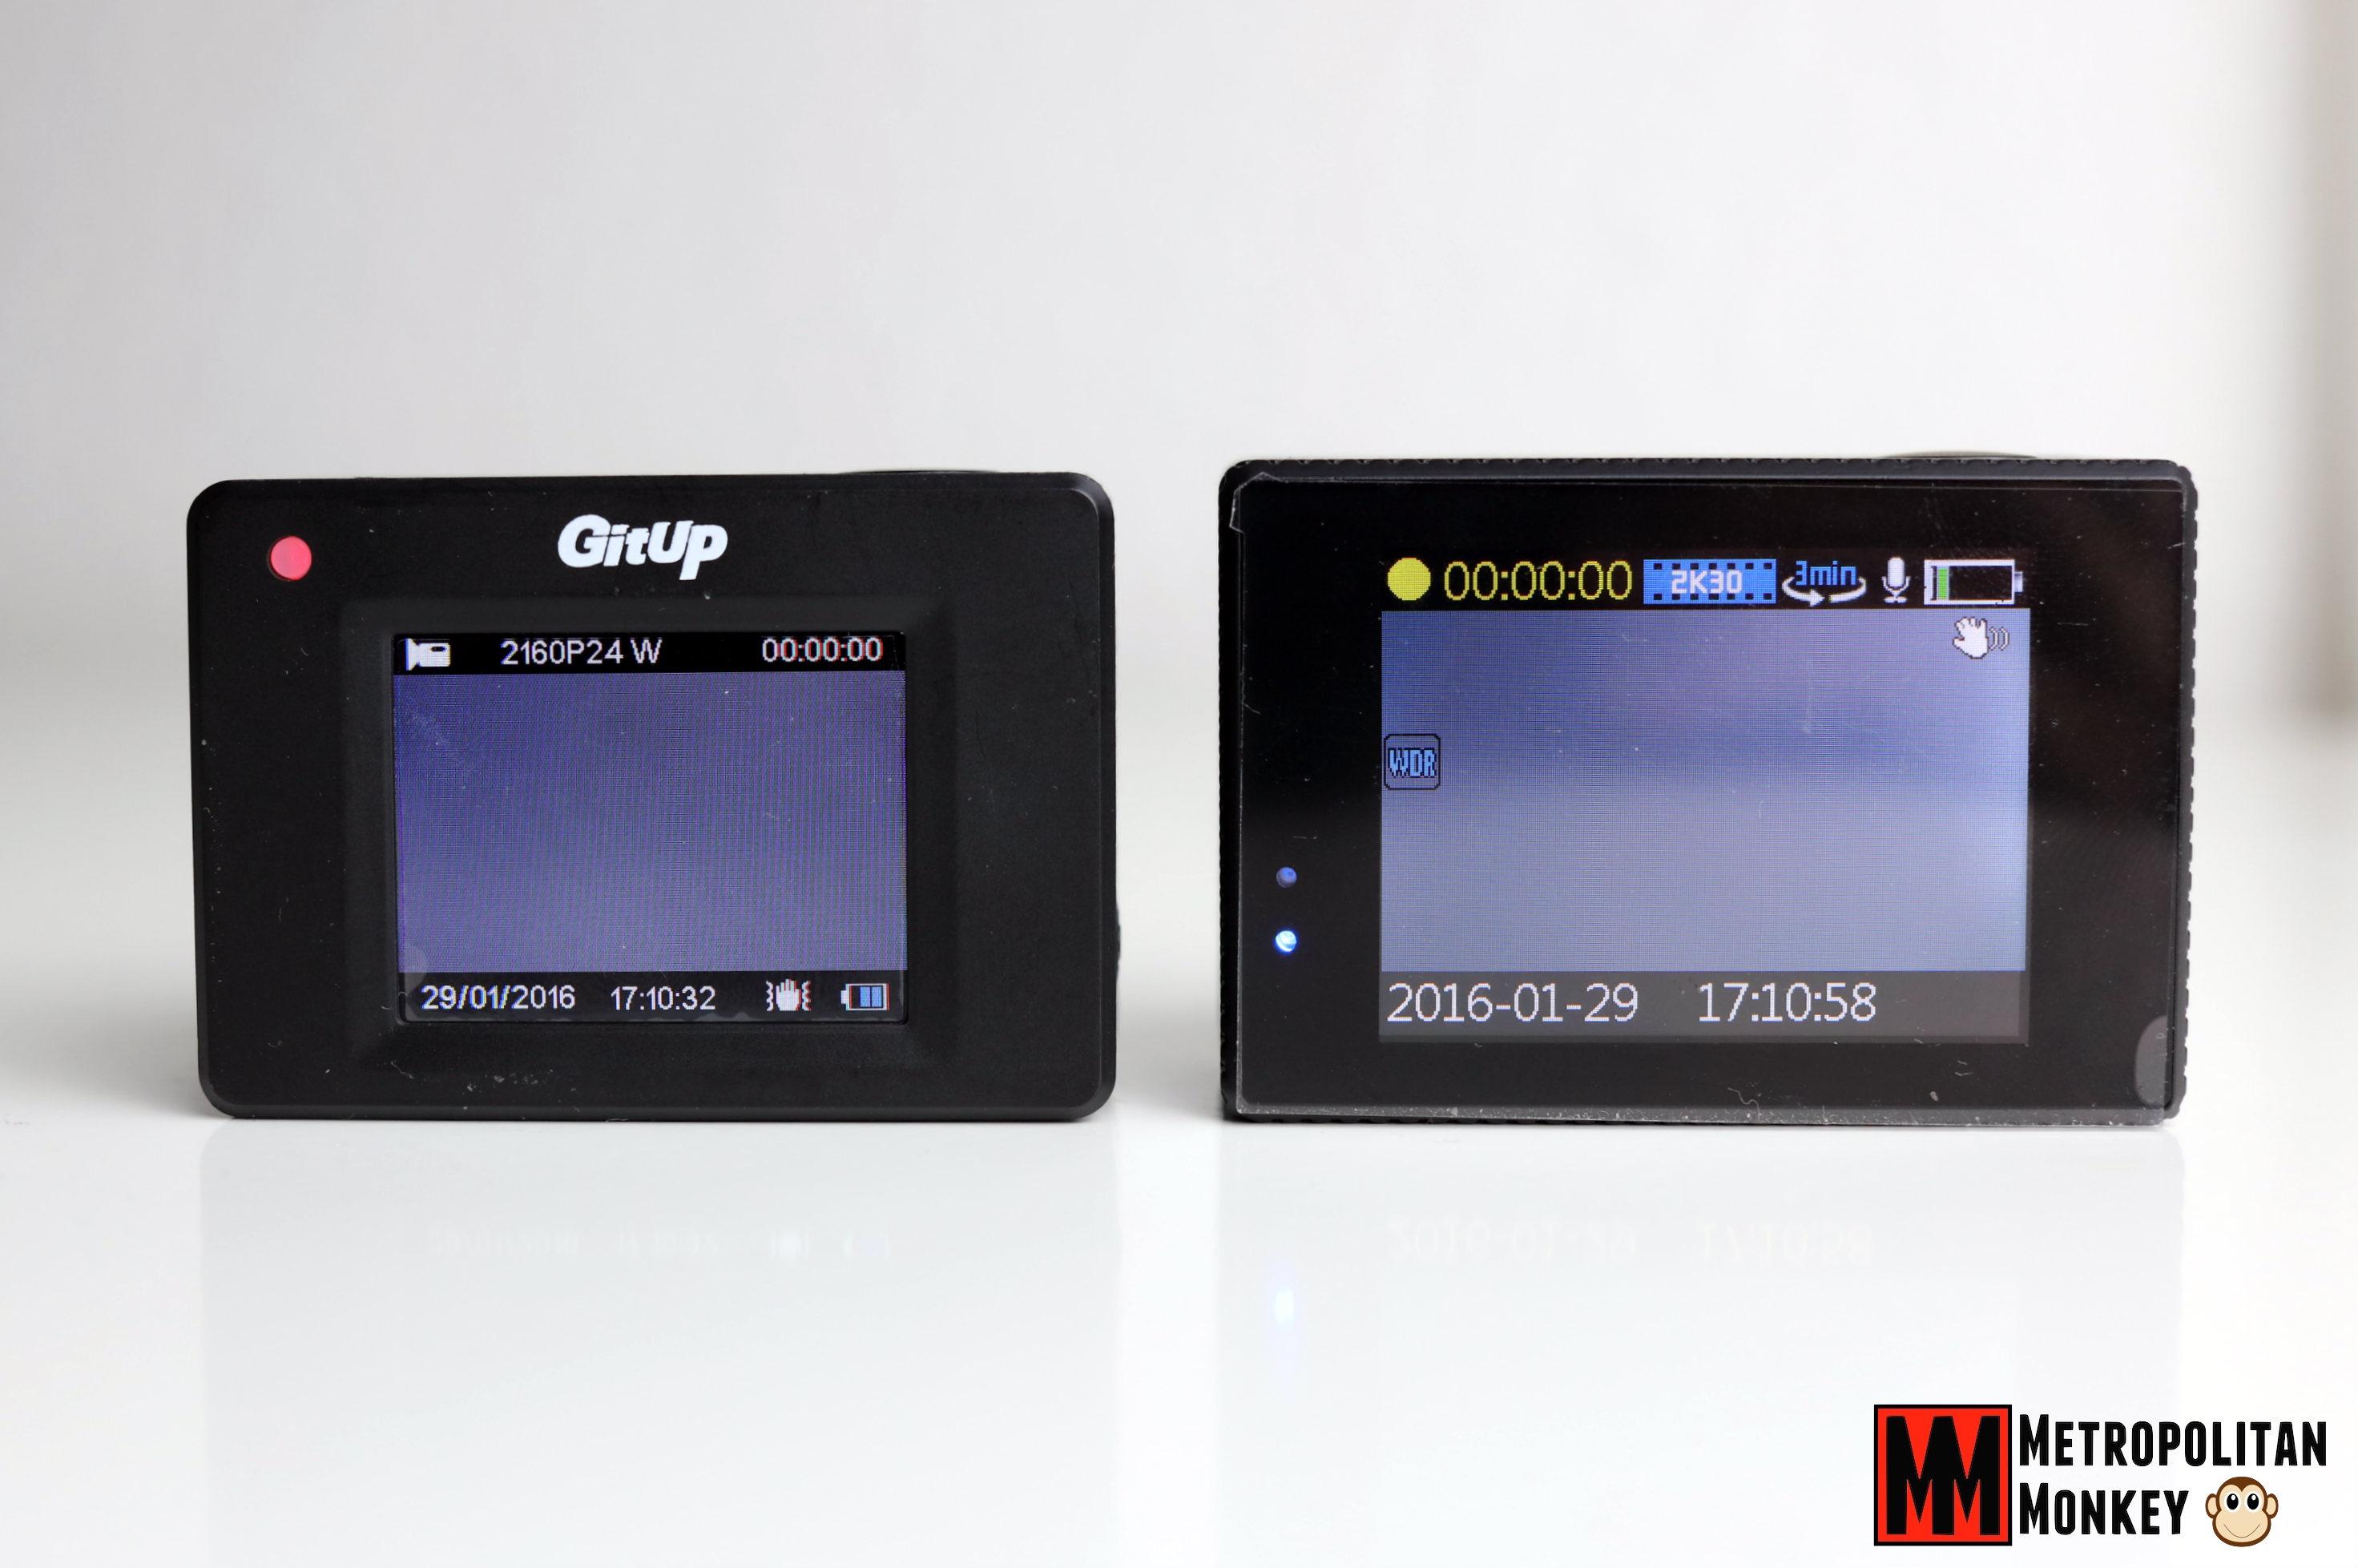 gitup git2 sjcam sj5000x elite display lcd 1.5 2.0 metropolitanmonkey.com